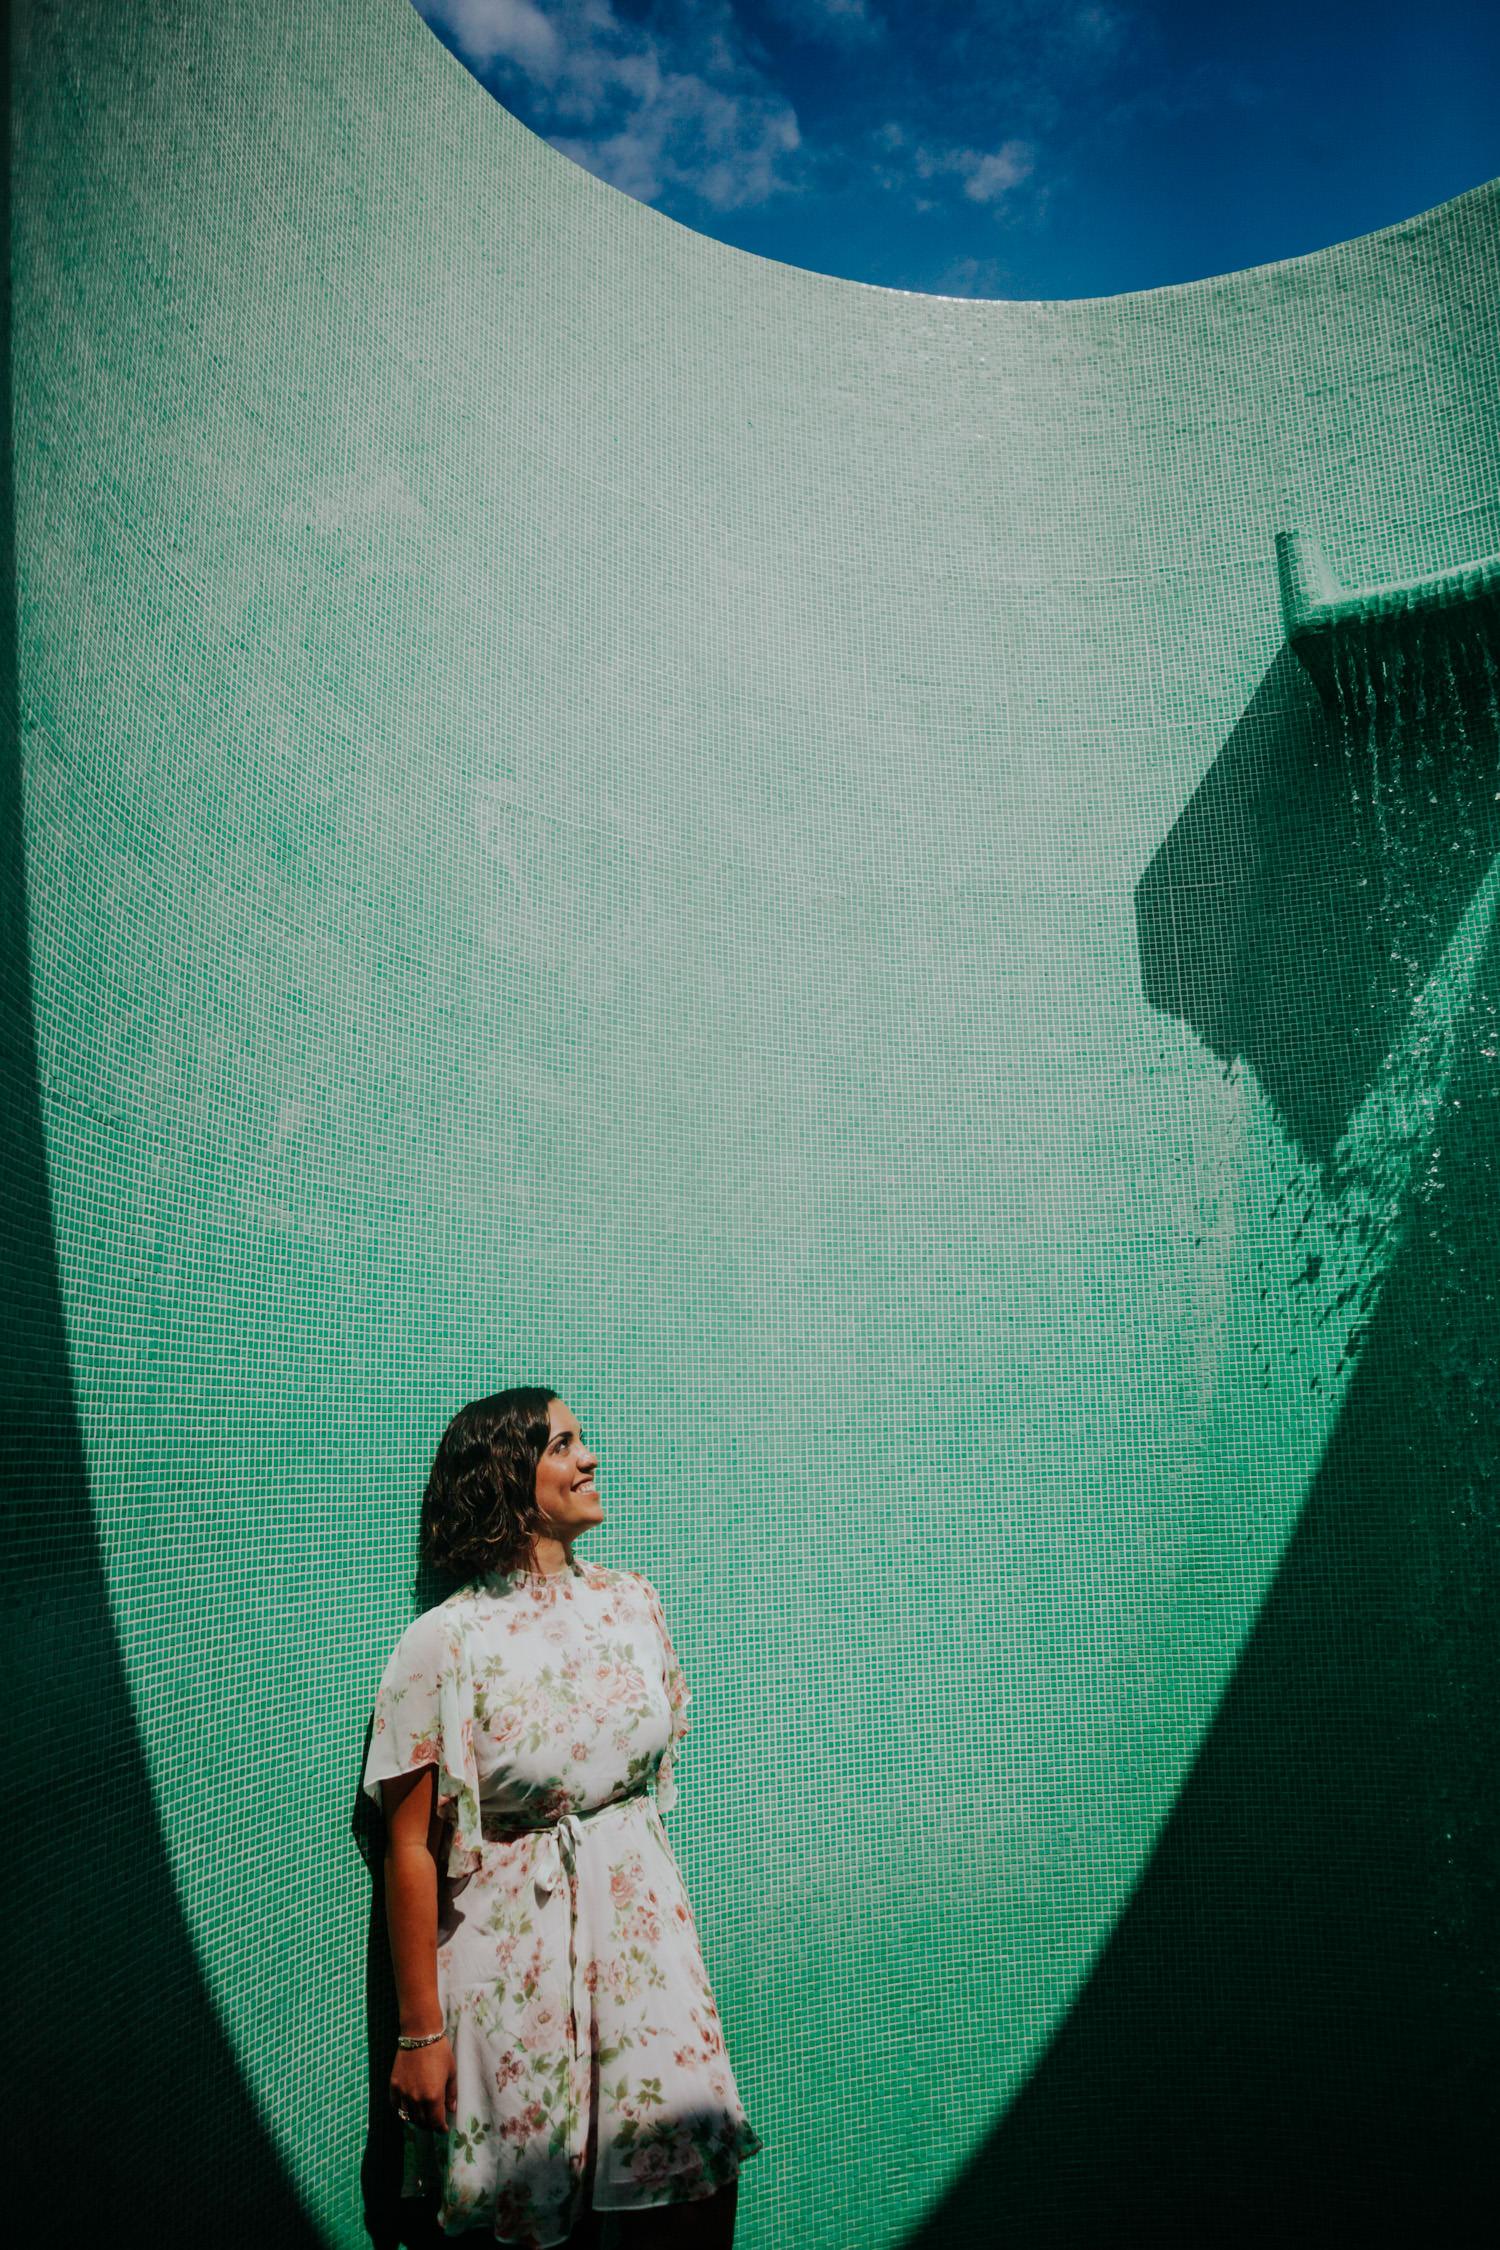 Fotografo-Boda-Hotel-Condesa-DF-Mexico-CDMX-Photography-Wedding-Pierce-20.jpg